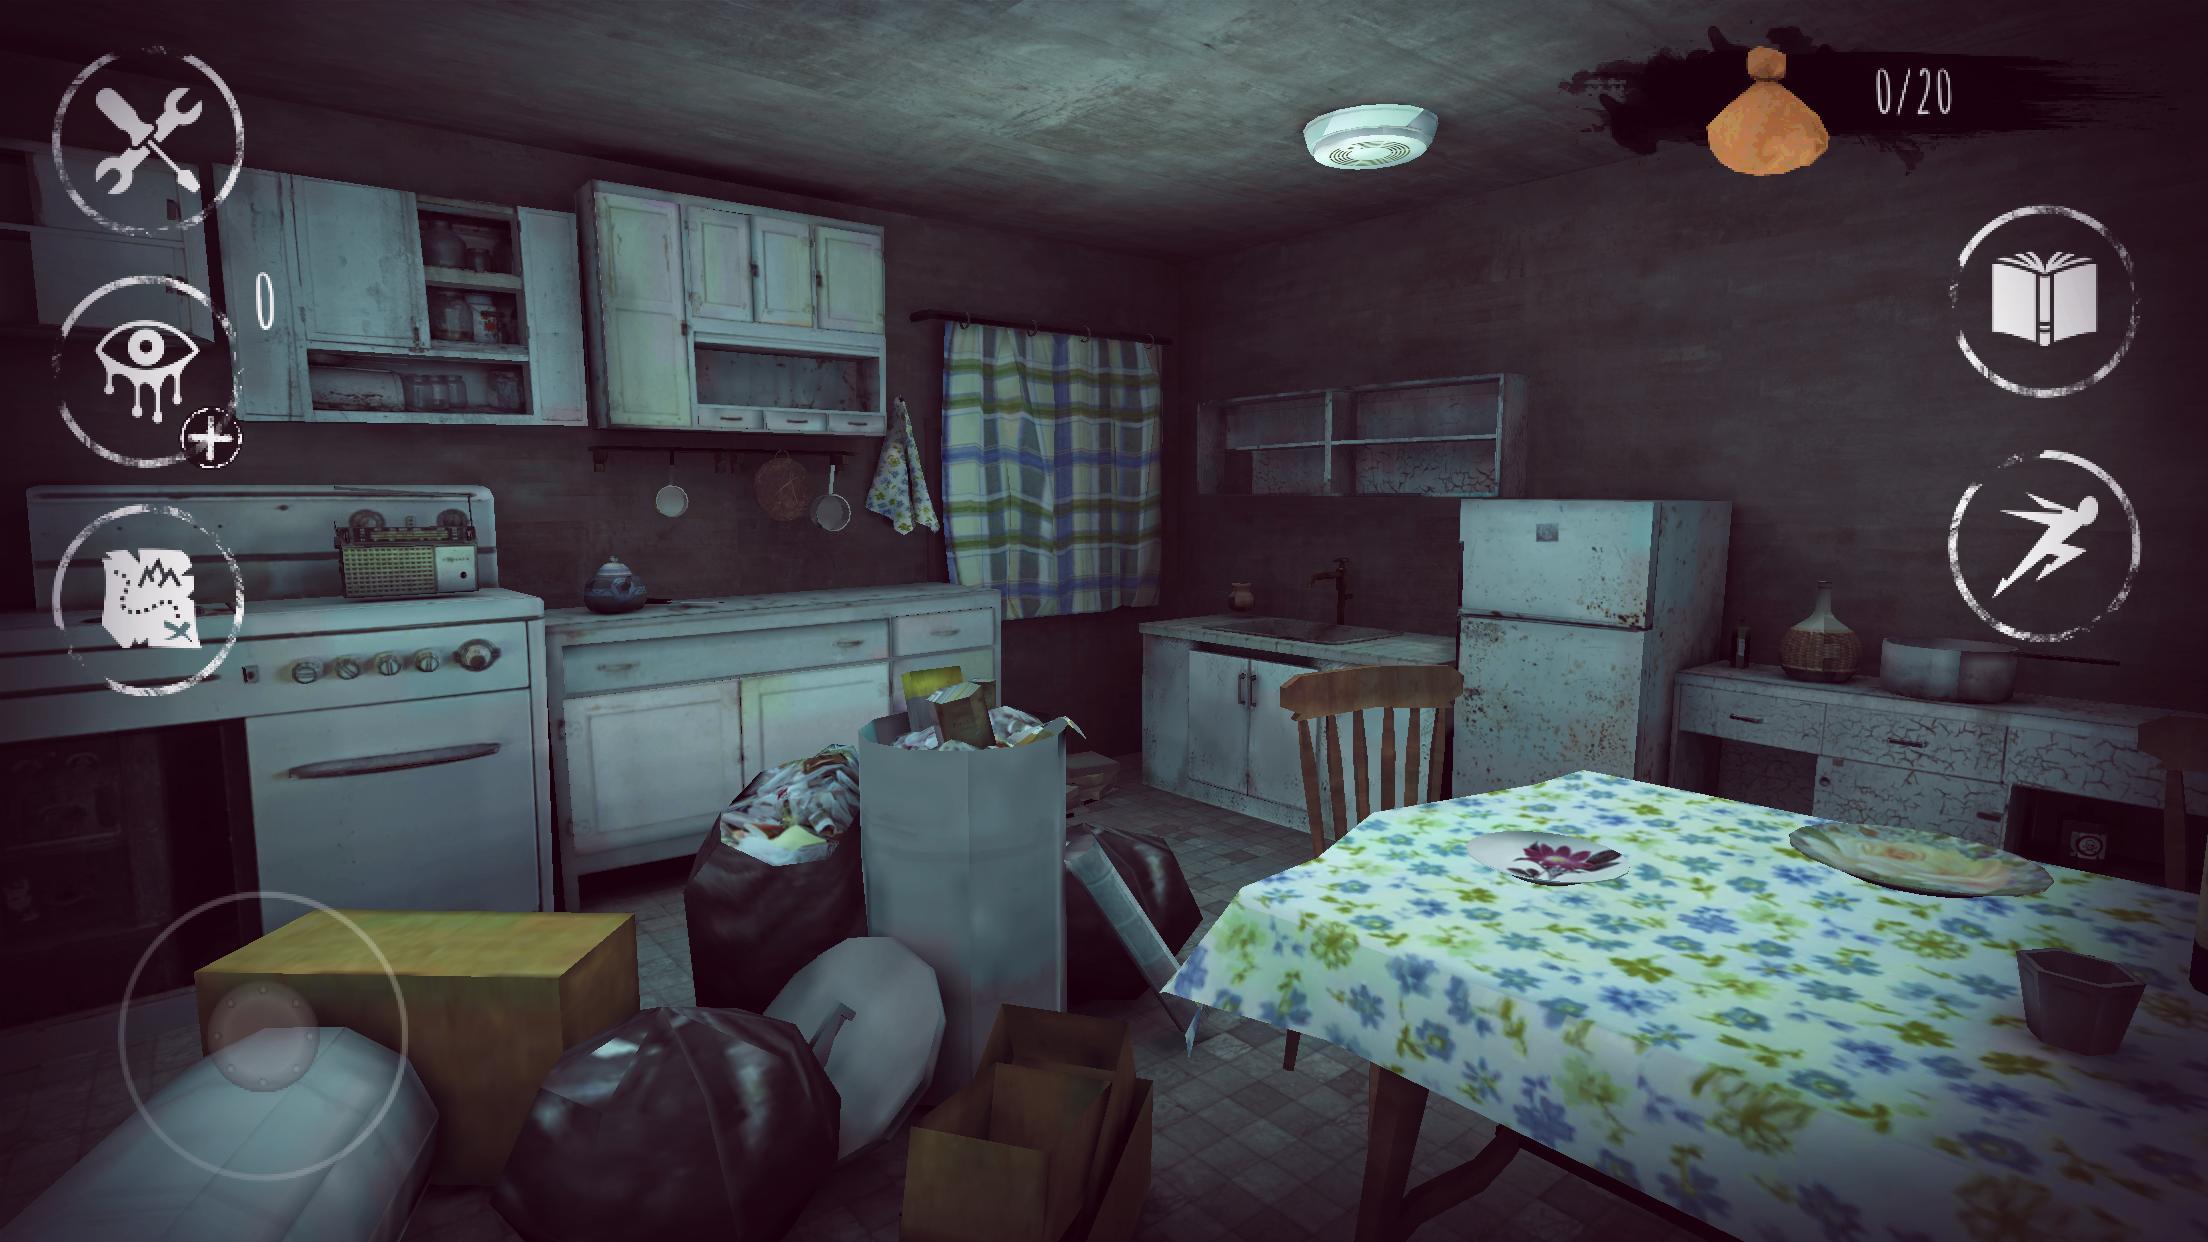 Eyes: Scary Thriller - Creepy Horror Game 6.1.1 Screenshot 16